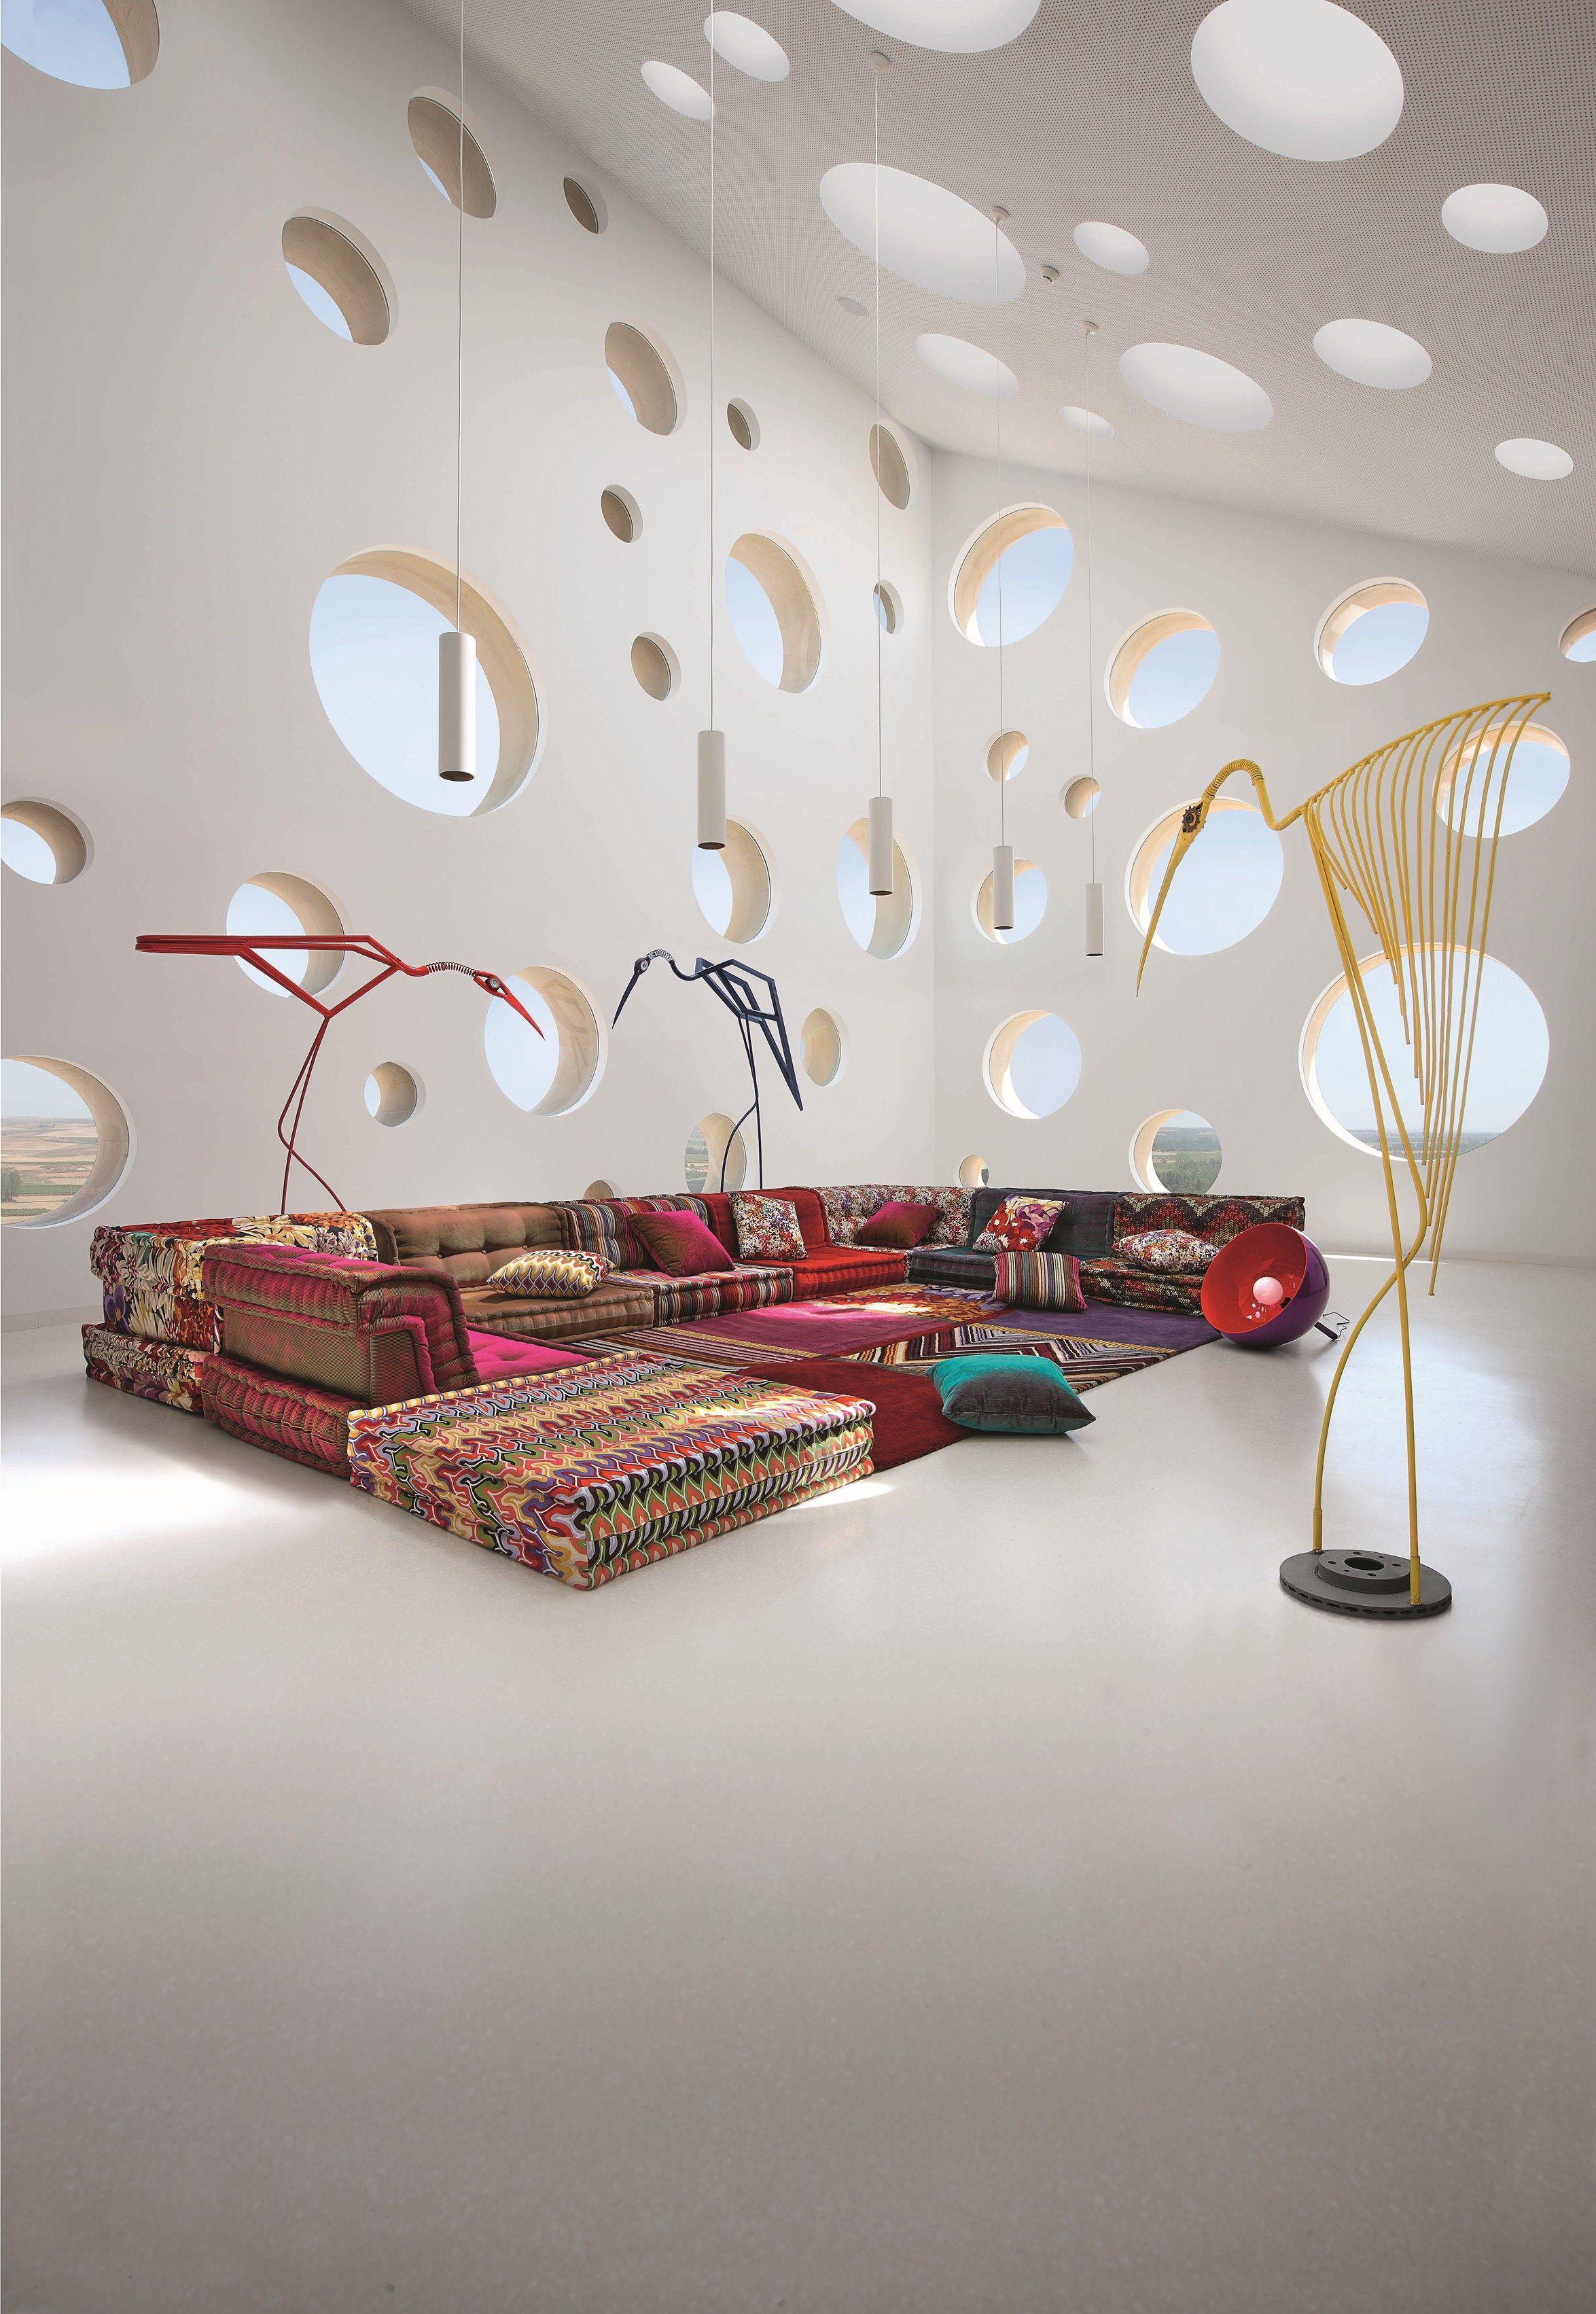 Anbausofa aus Stoff MAH JONG MISSONI HOME By ROCHE BOBOIS Design ...